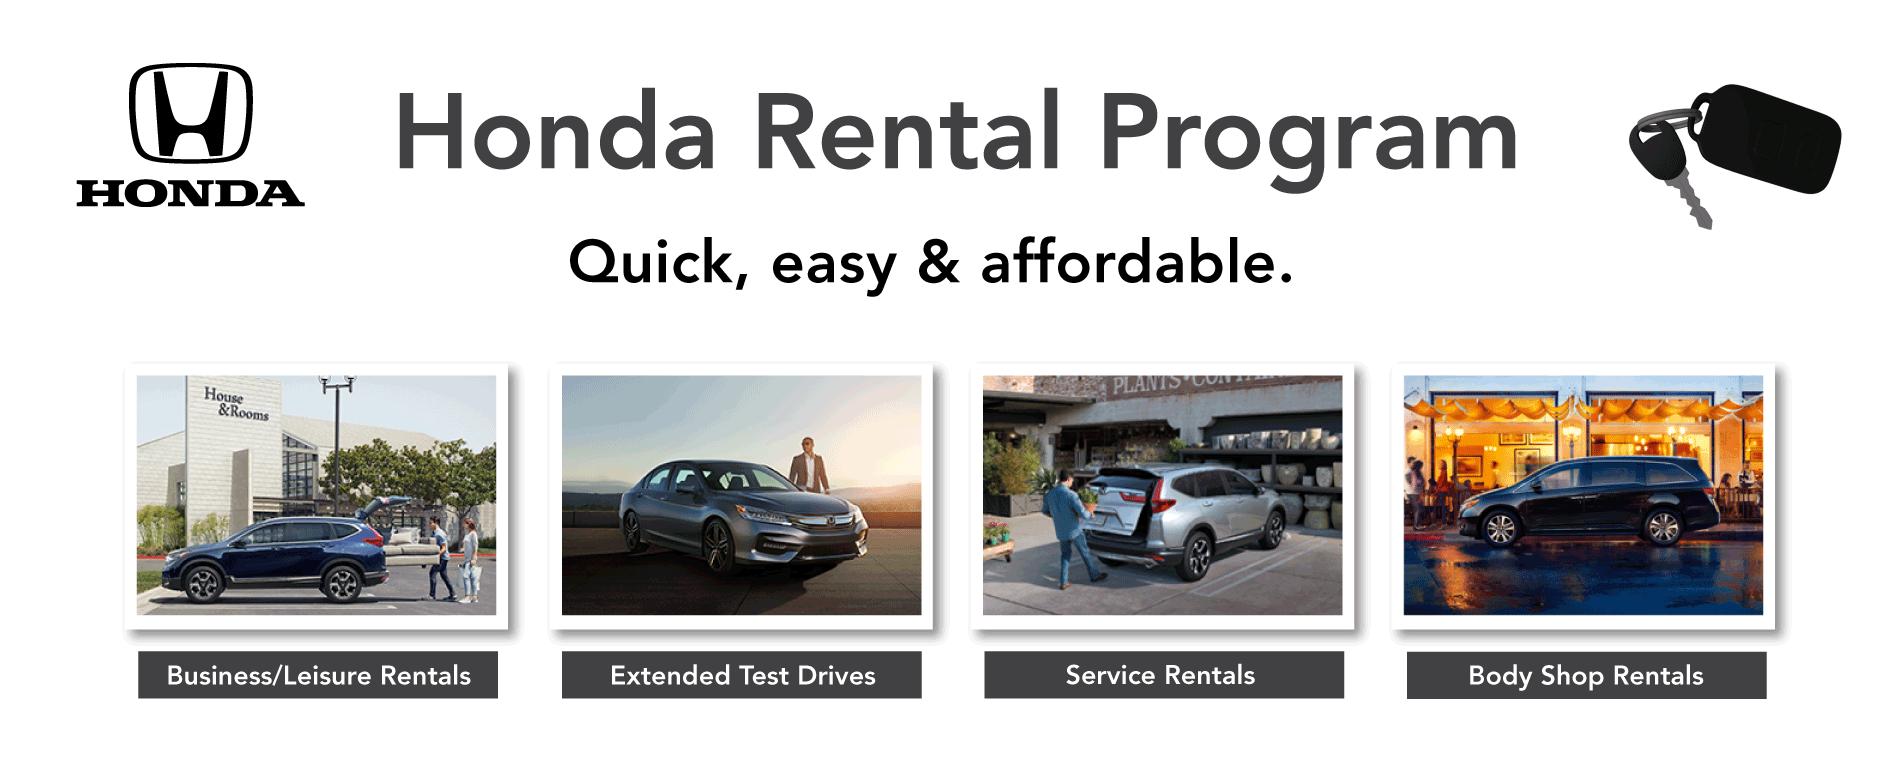 New Honda Rental Cars Middlekauff Honda